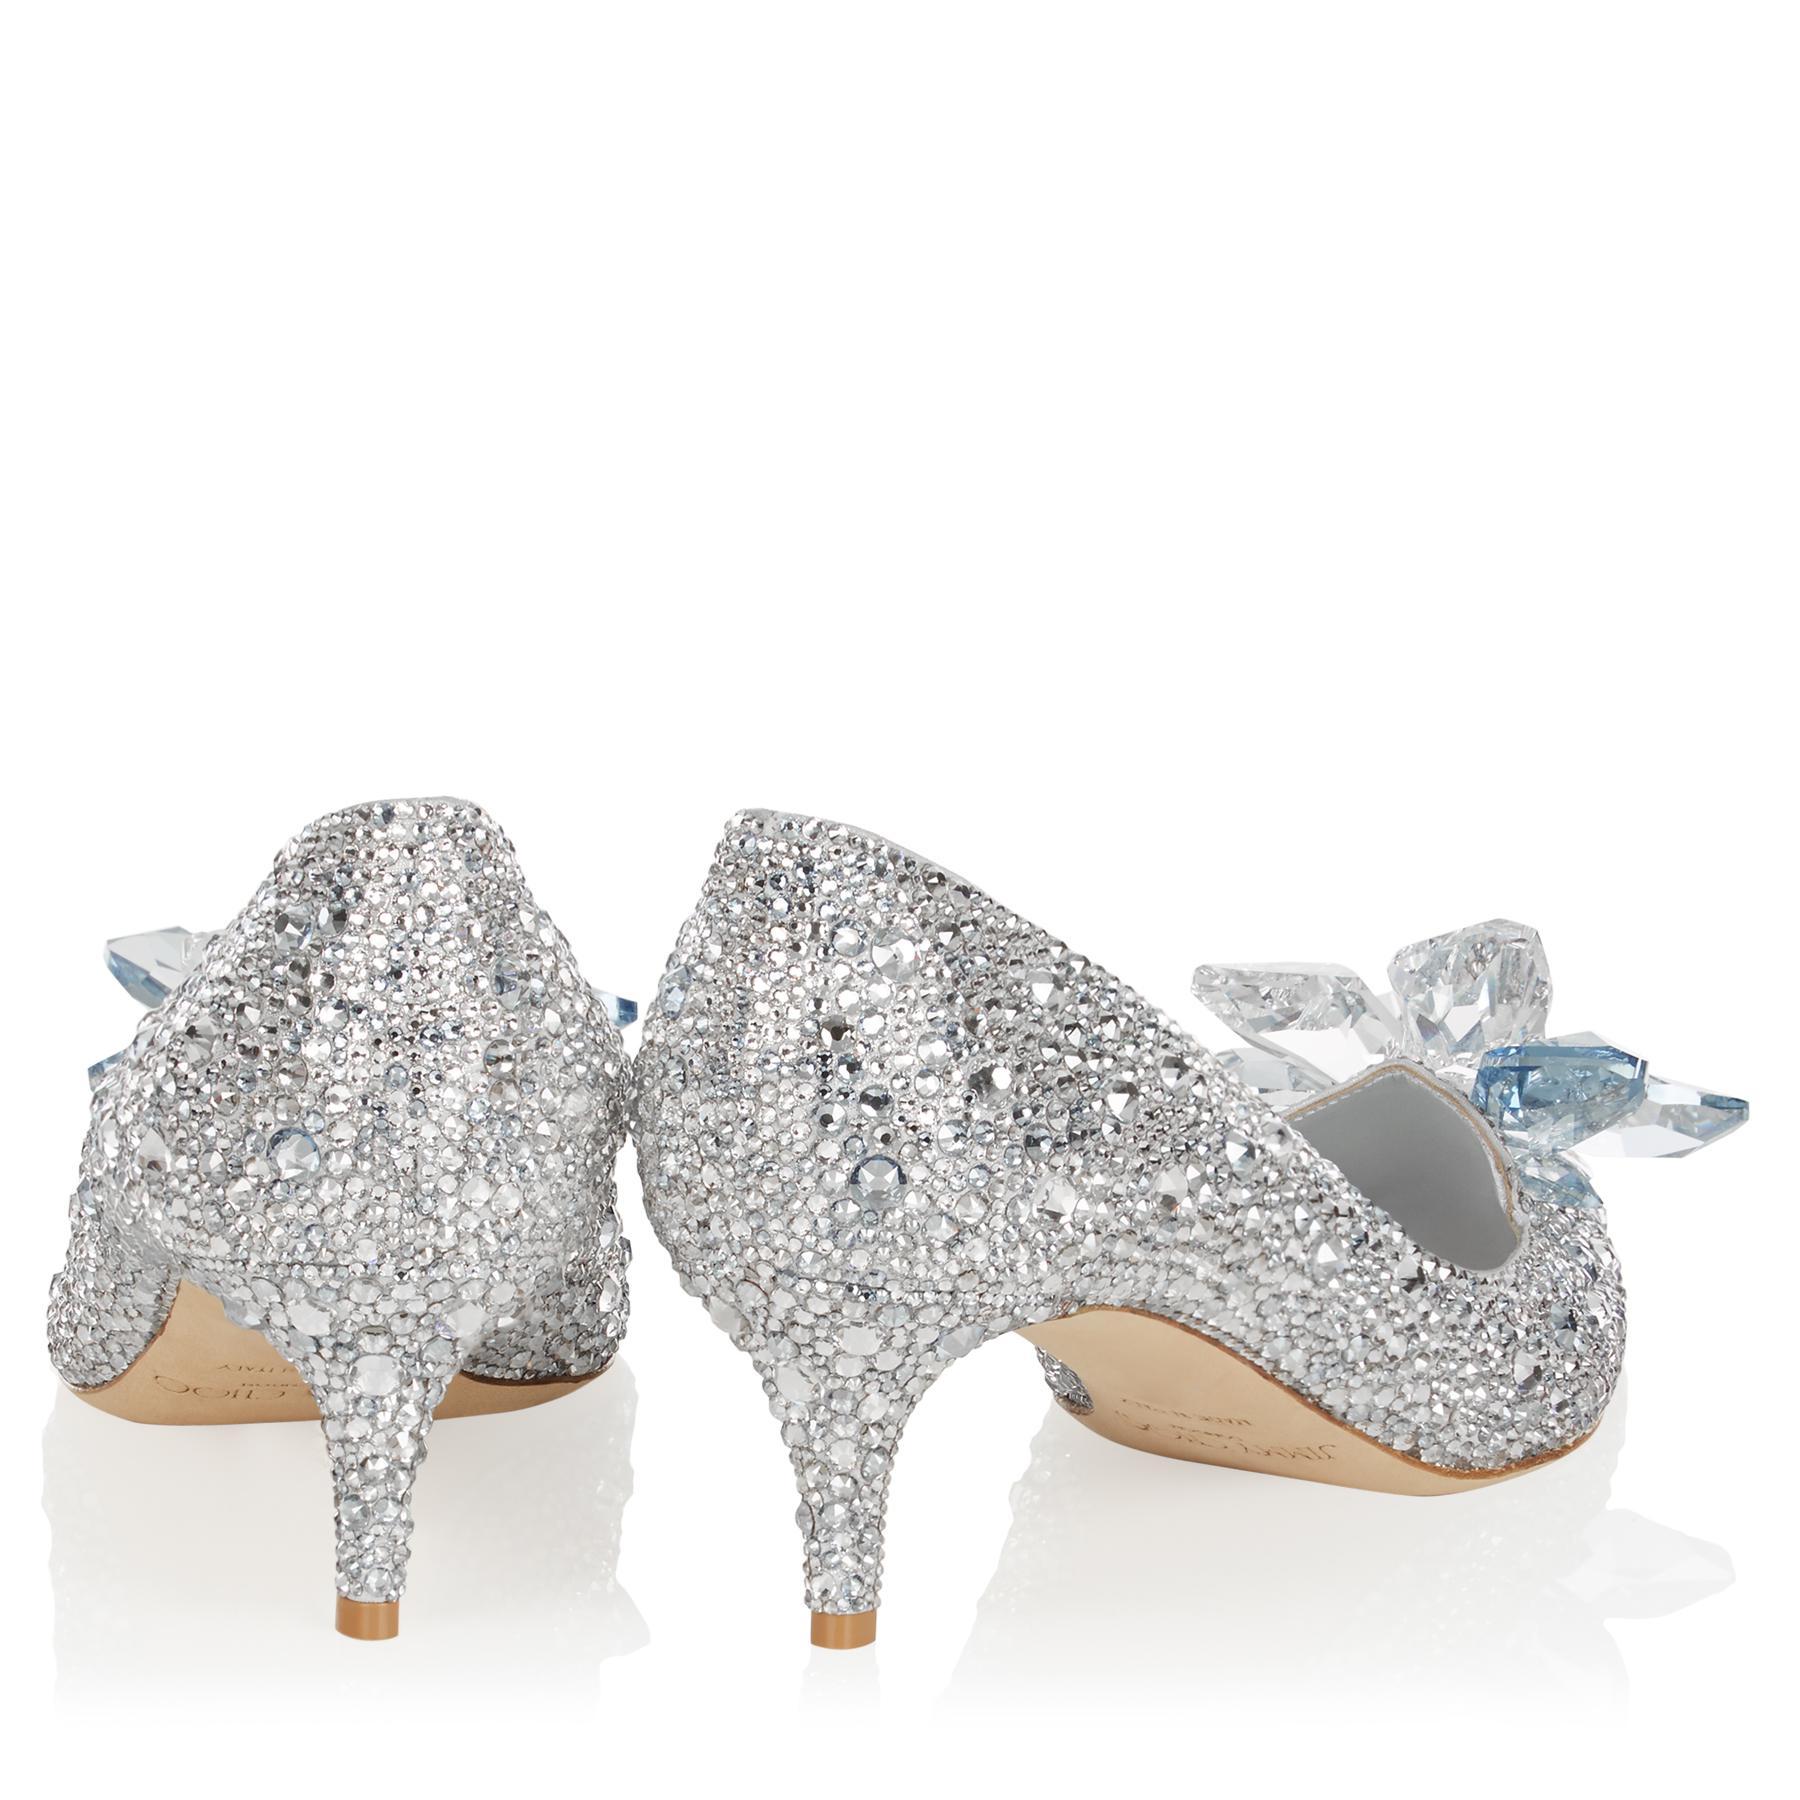 0b4c859dfa8 Jimmy Choo - Metallic Allure Crystal Covered Pointy Toe Pumps - Lyst. View  fullscreen